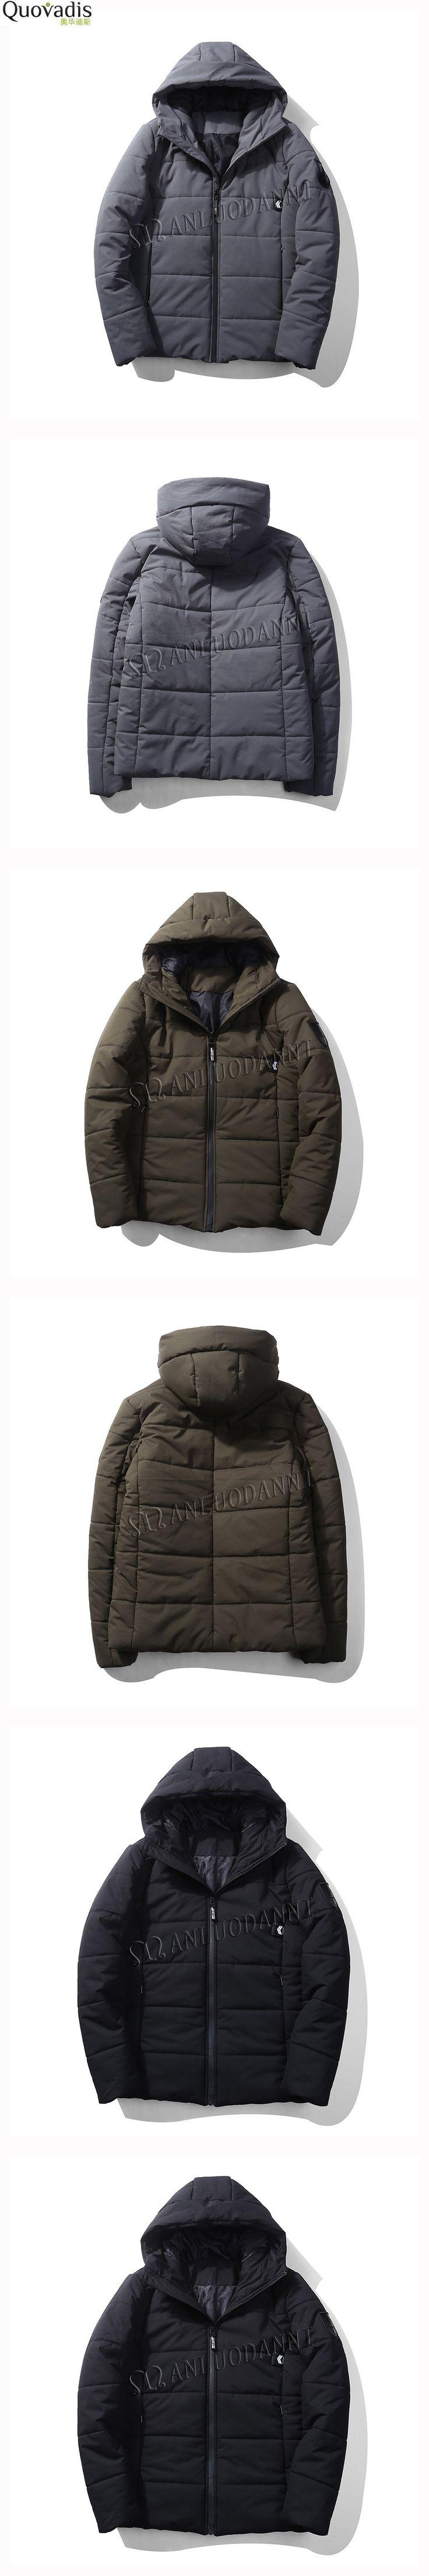 new Winter Cotton Cotton-padded Clothes Keep Warm down Jacket men coat parkas parka hombre hood outerwear(China) plus size